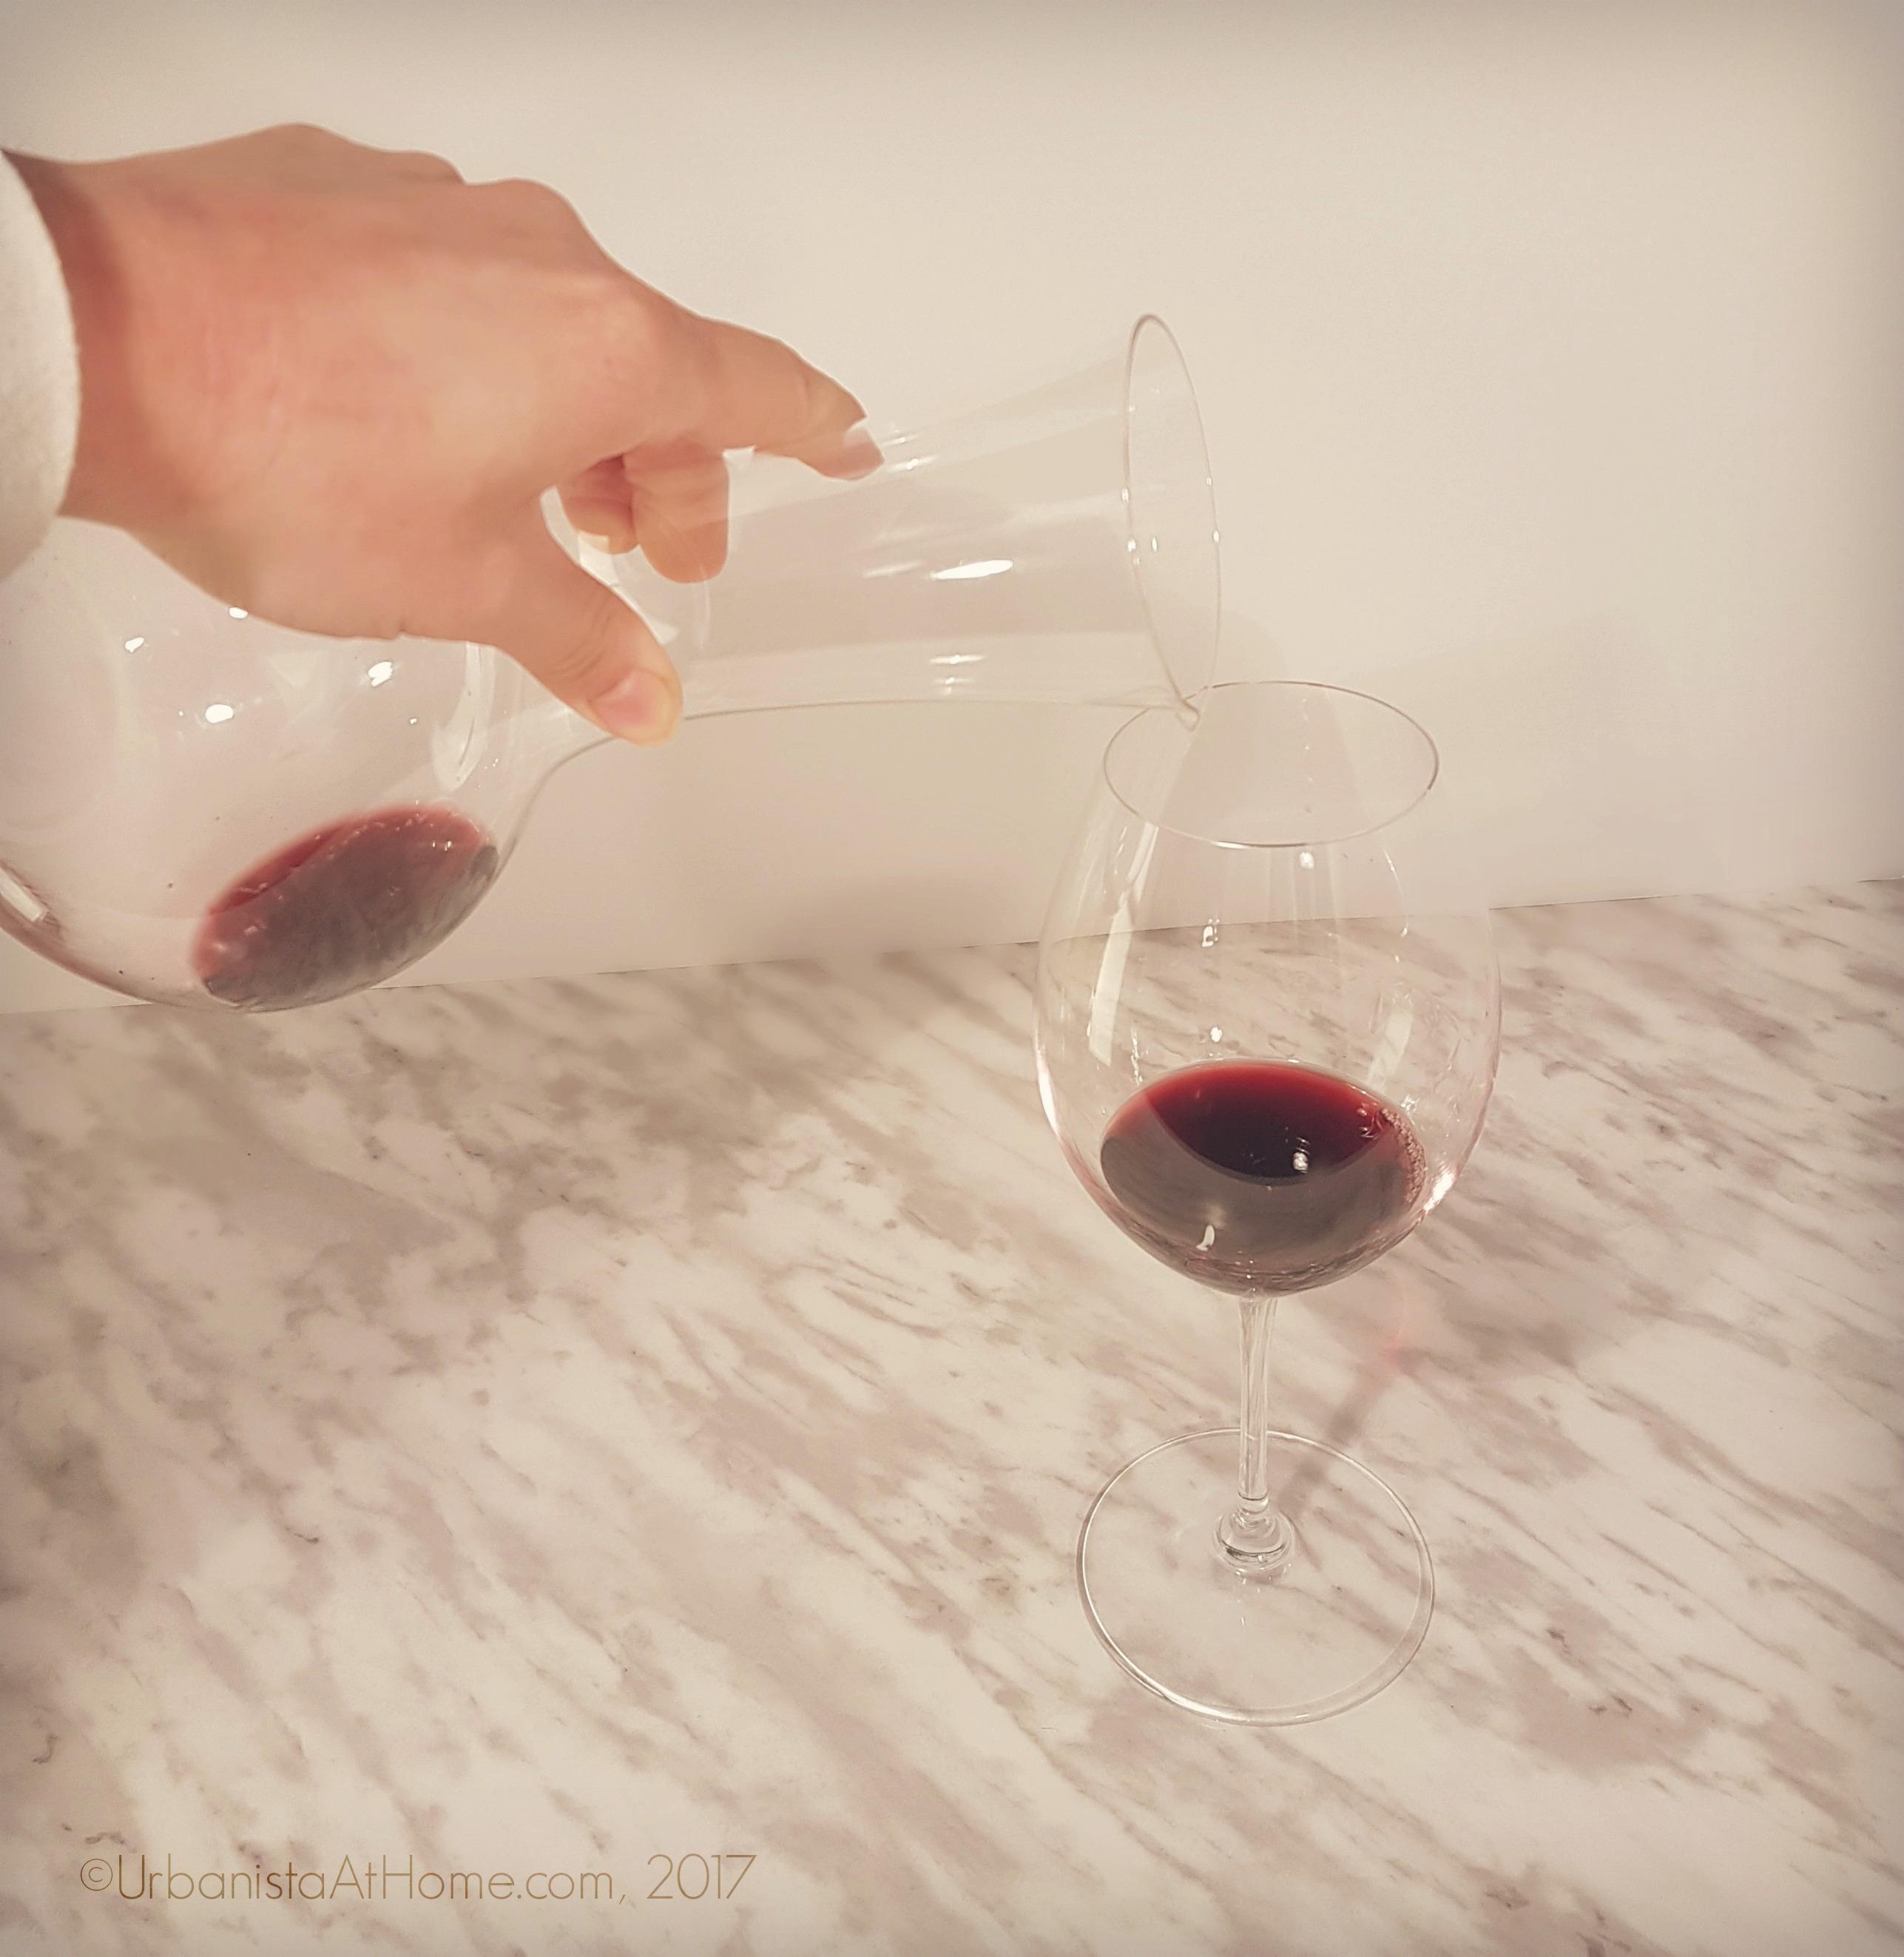 UrbanistaAtHome.com- Wine glass and decanter